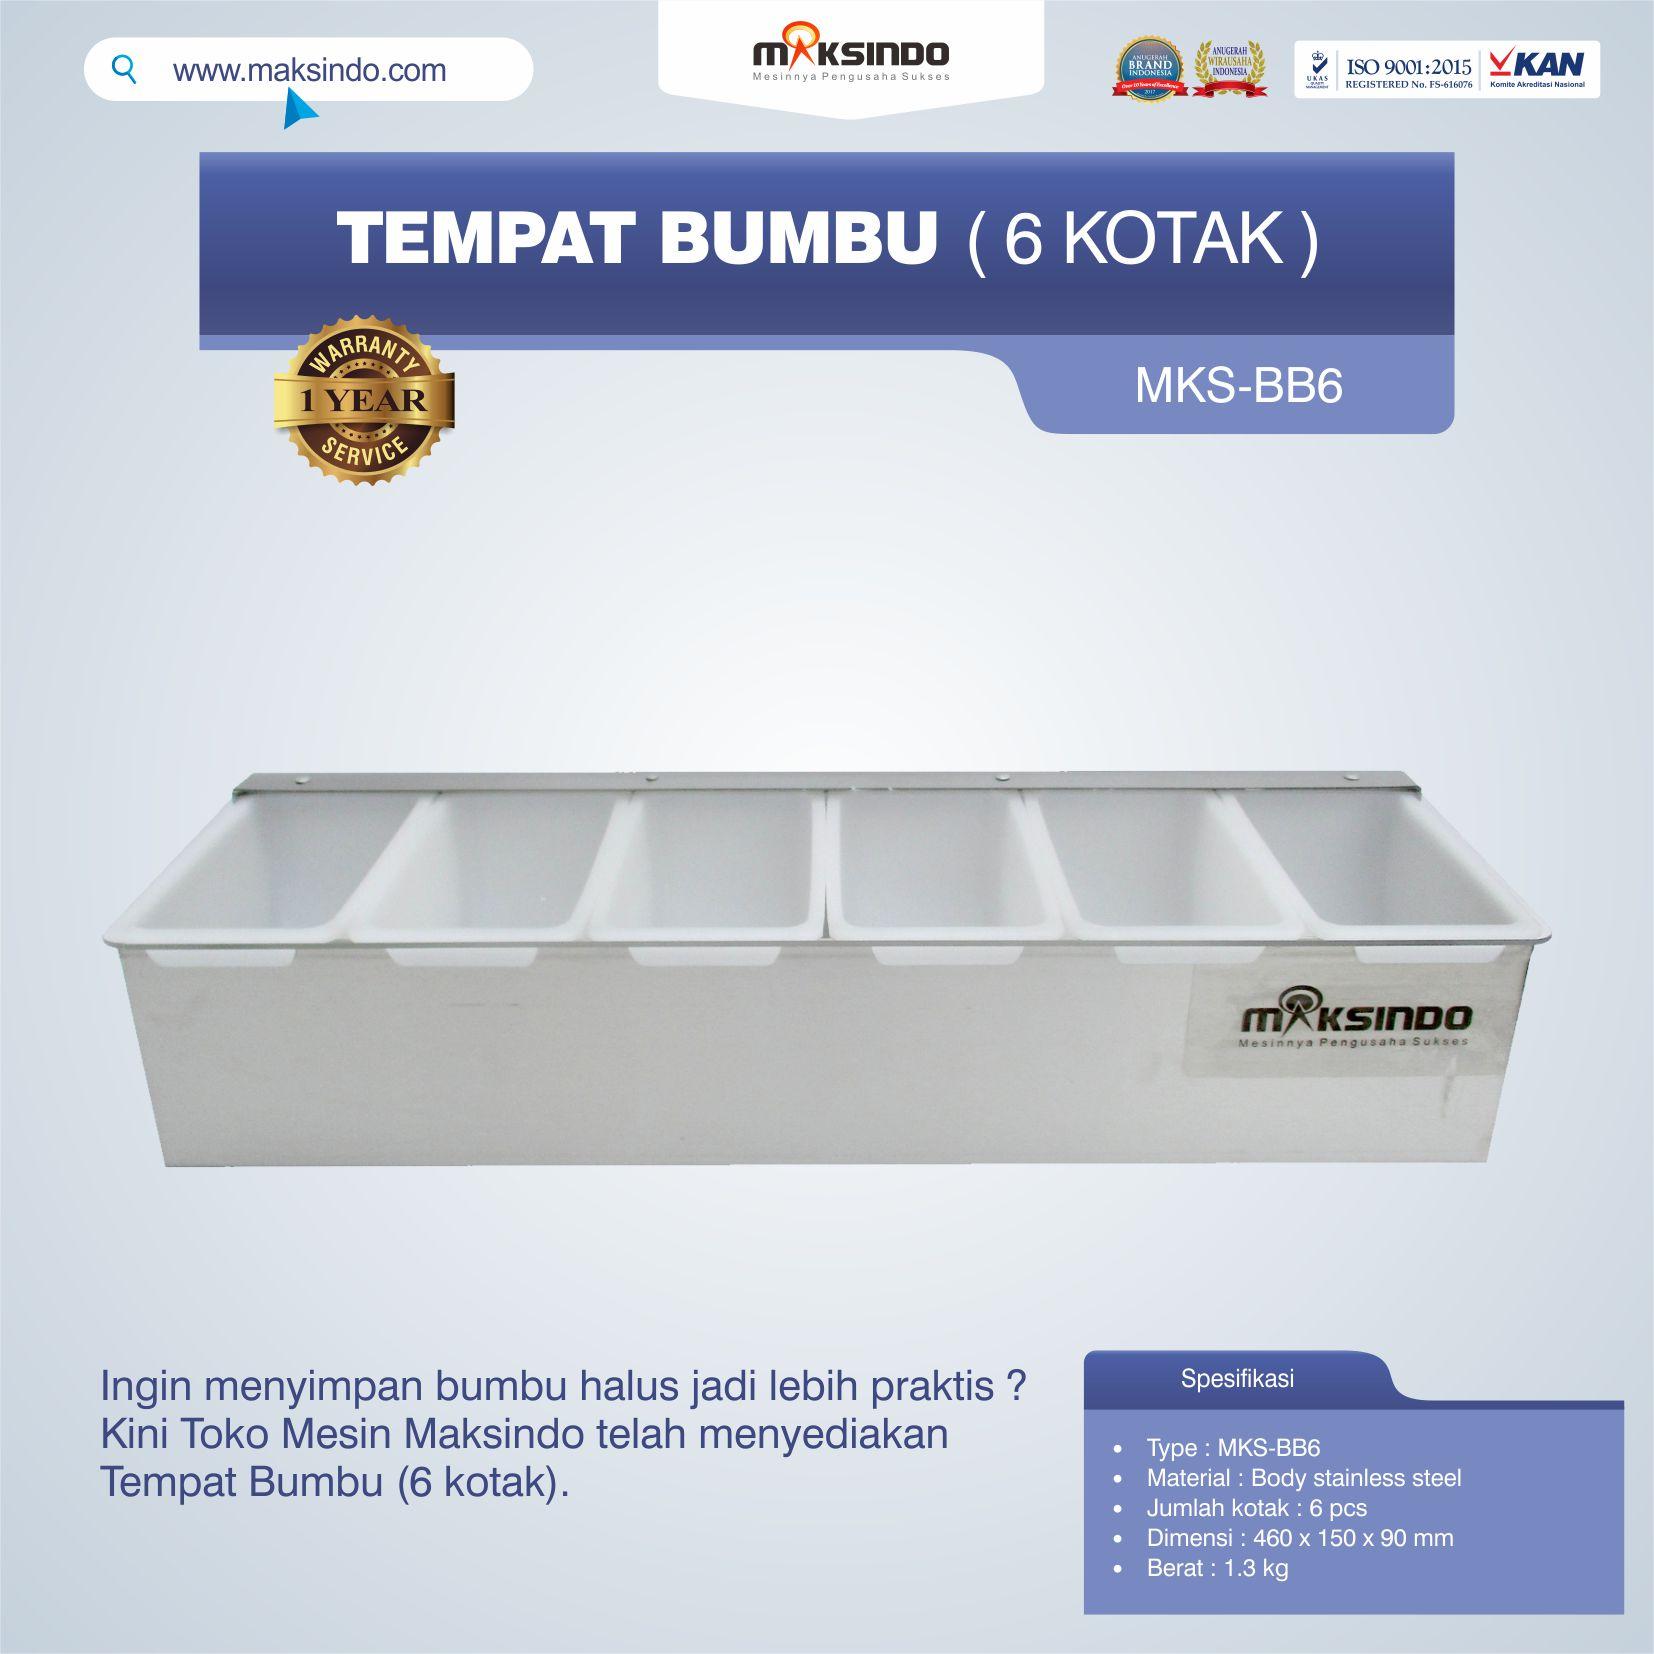 Jual Tempat Bumbu (6 kotak) di Jakarta